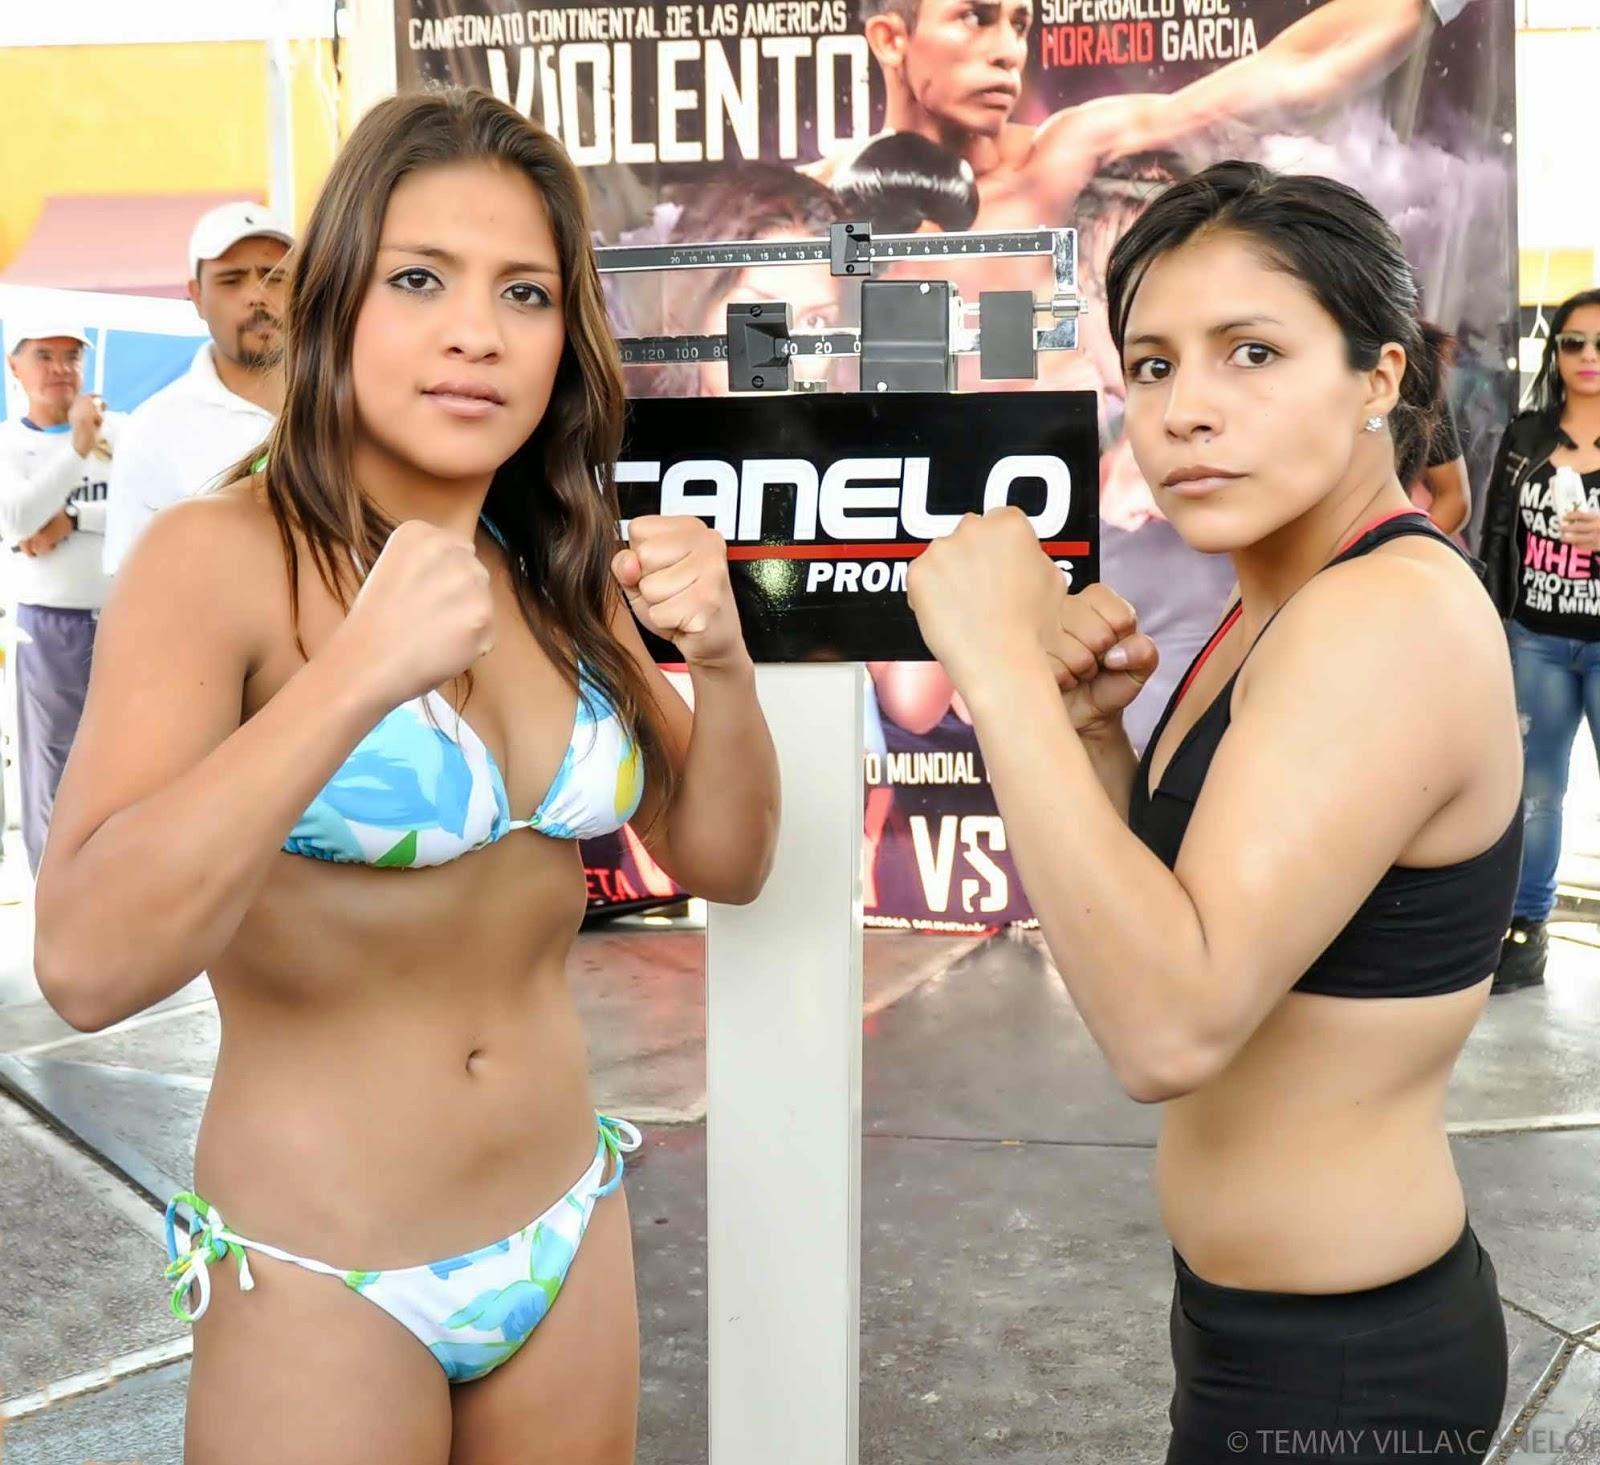 Gaby Potencia Nude boxeo hoy : box today: alondra garcia vs ivonne rosas - full